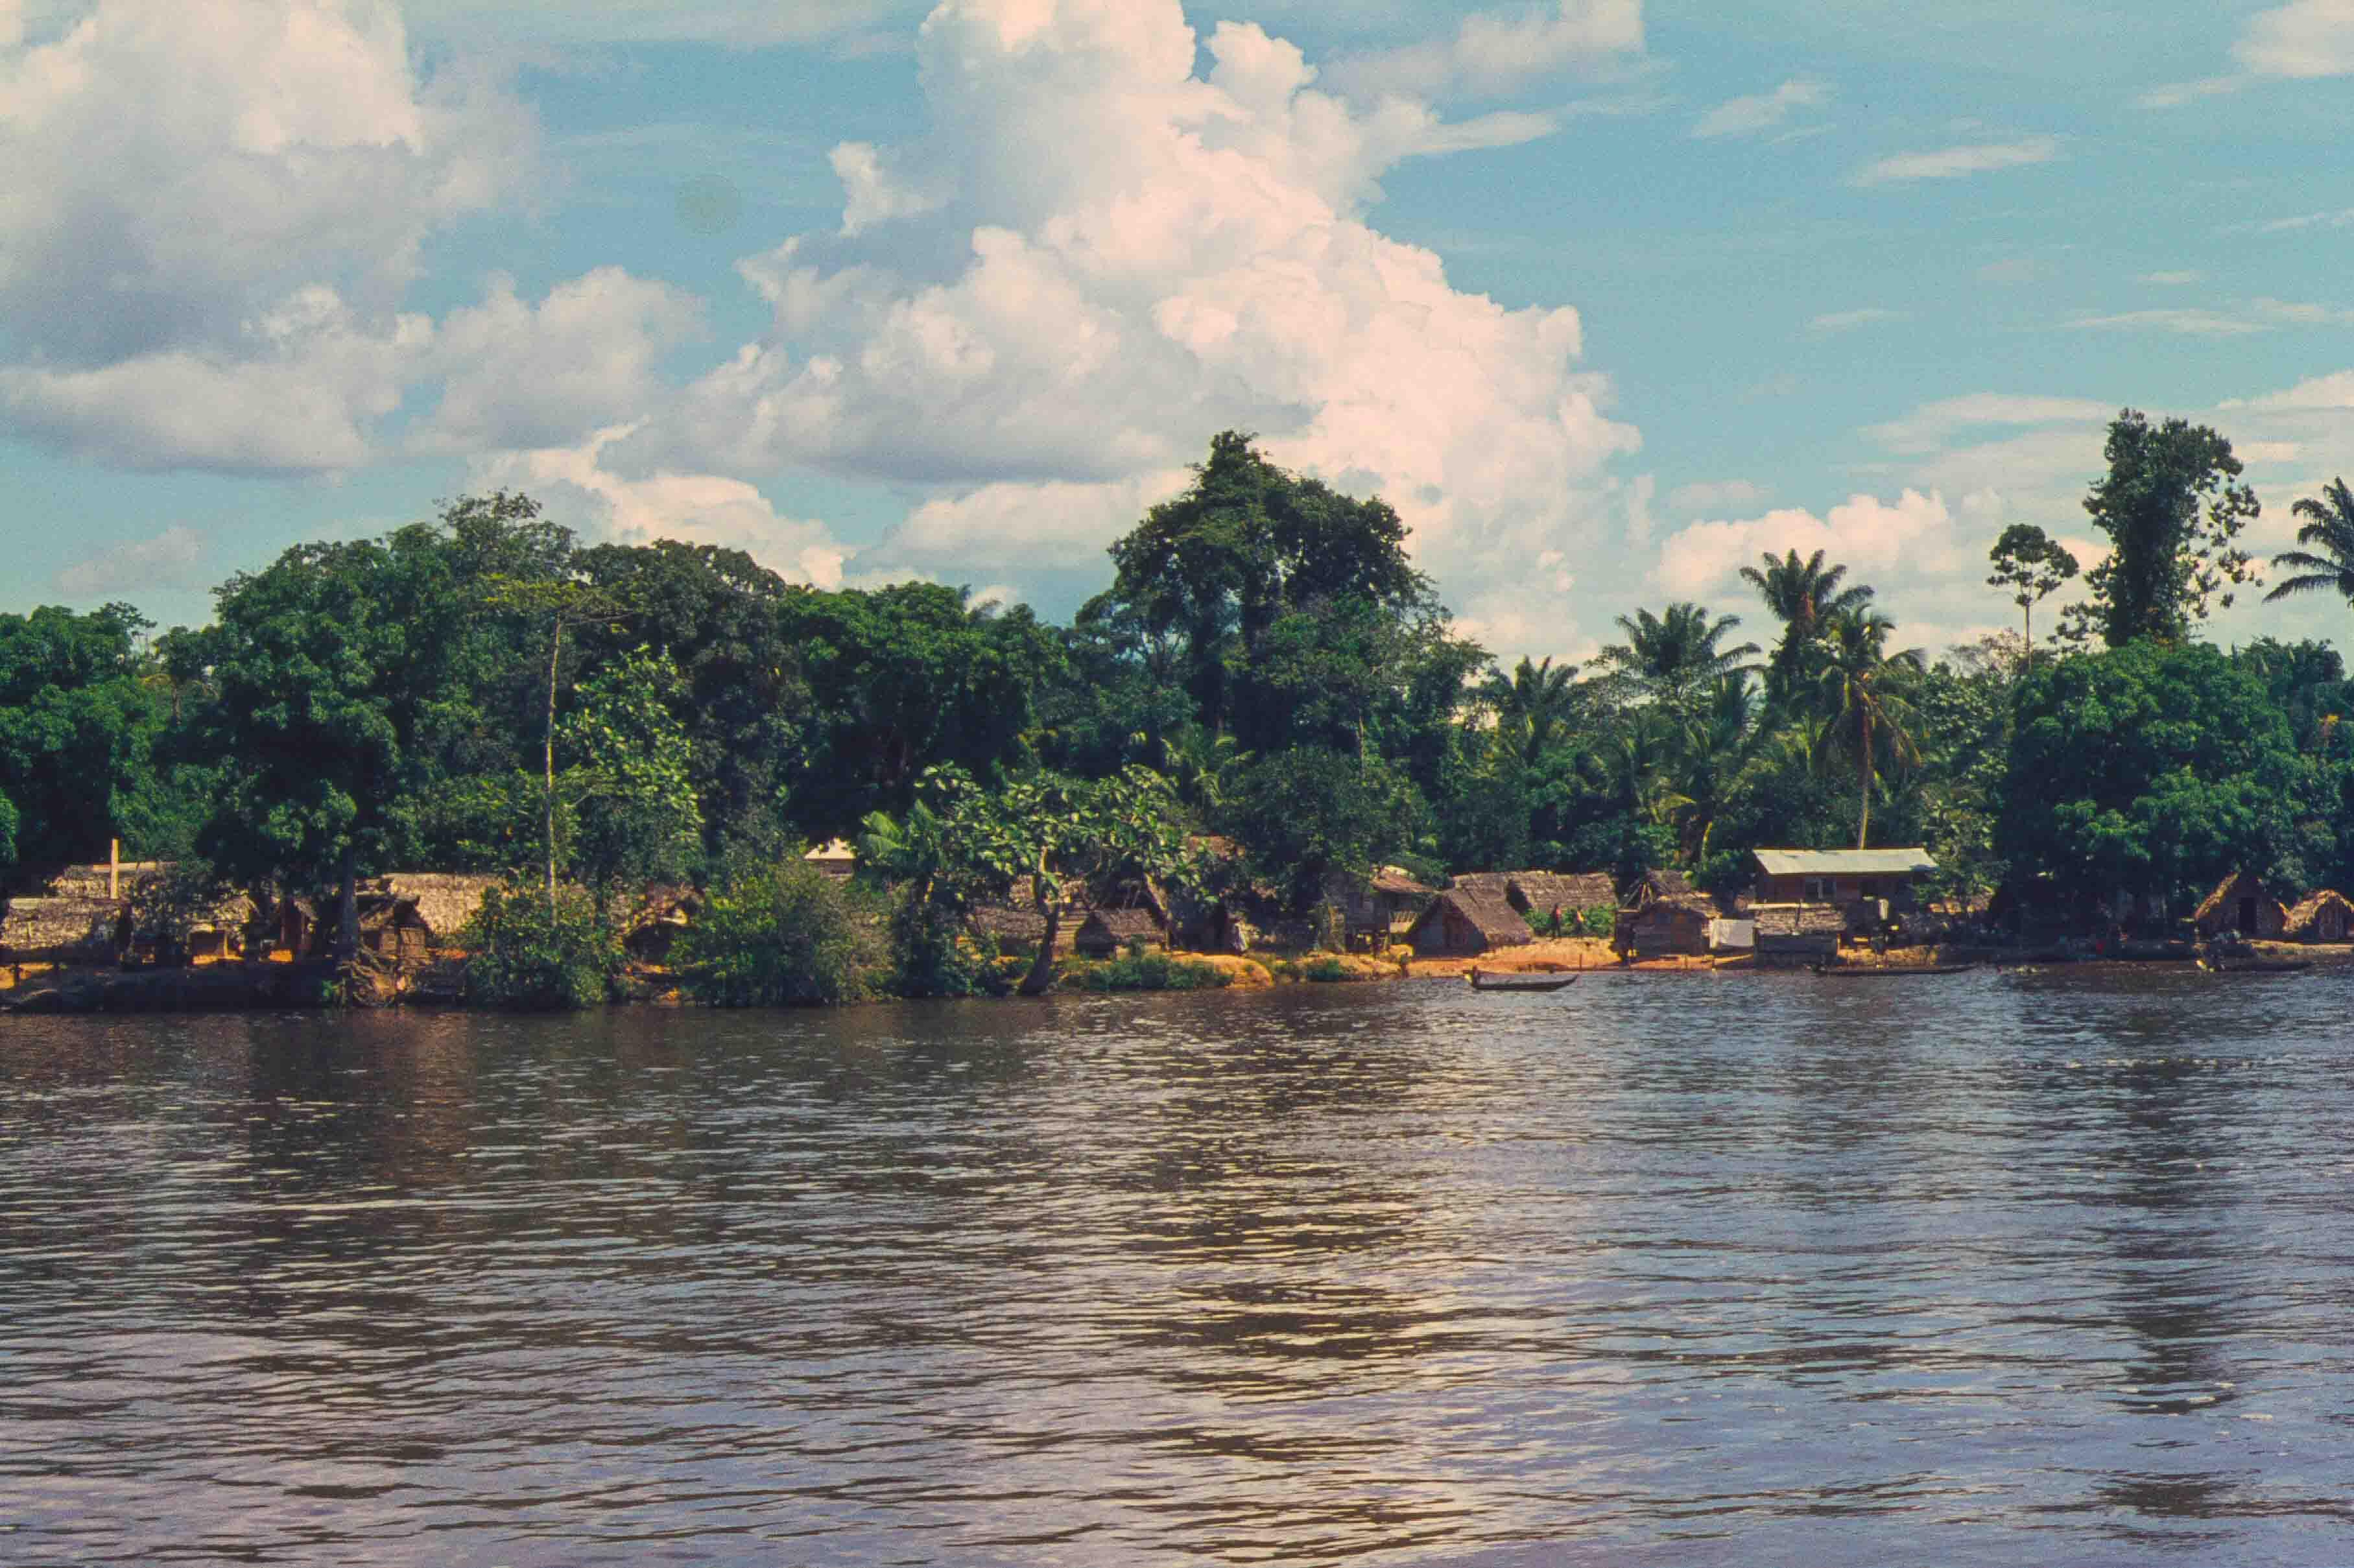 465. Suriname